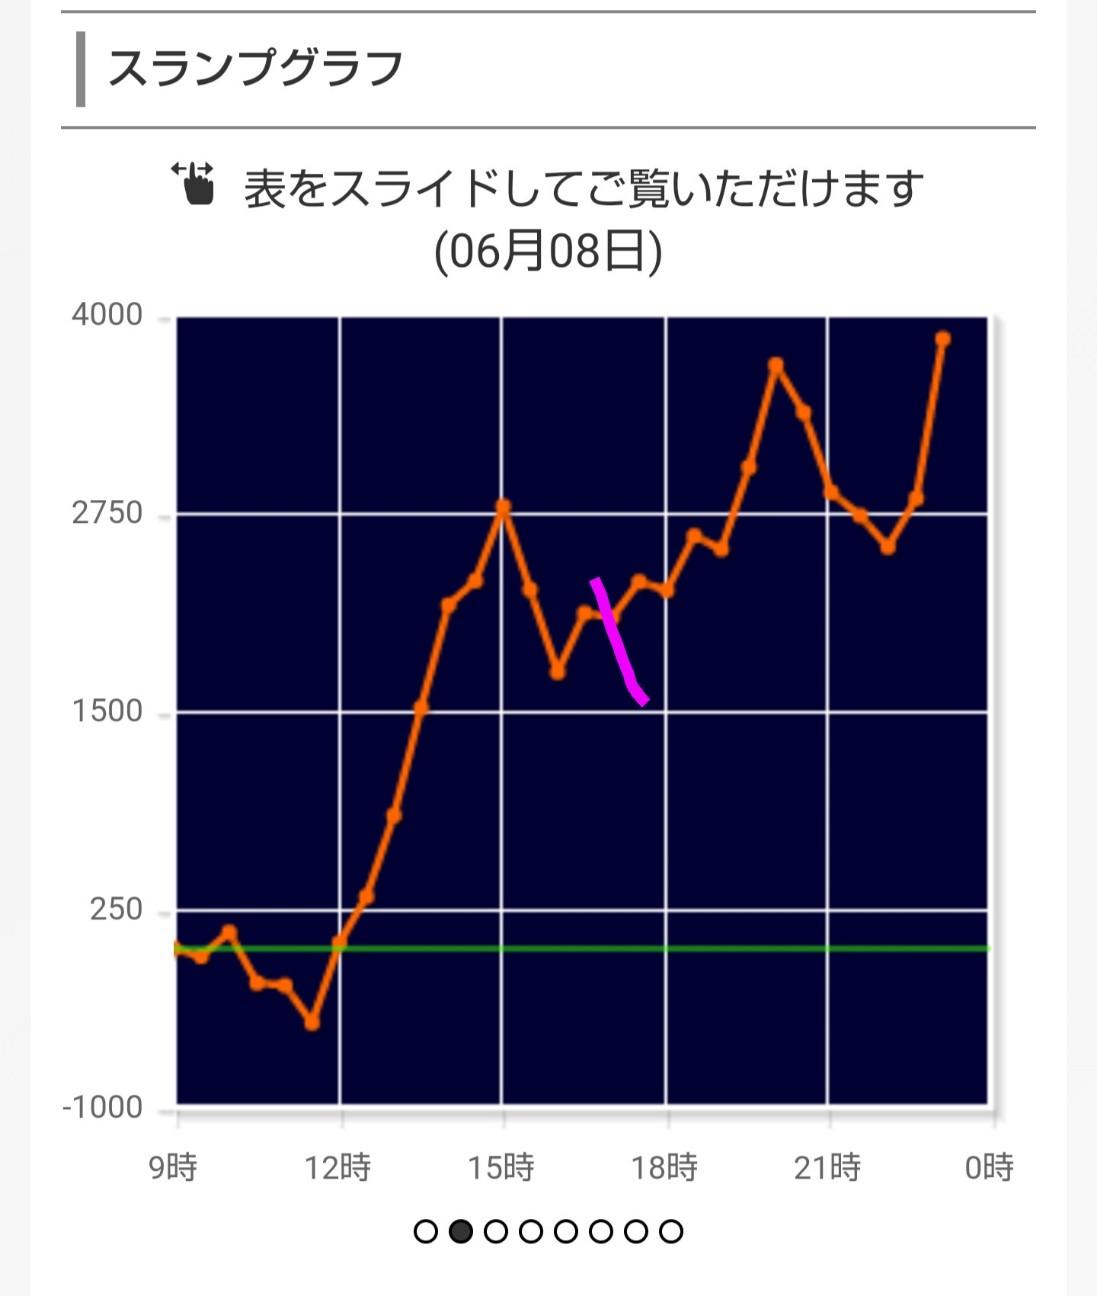 f:id:nagikoro:20190610024018j:plain